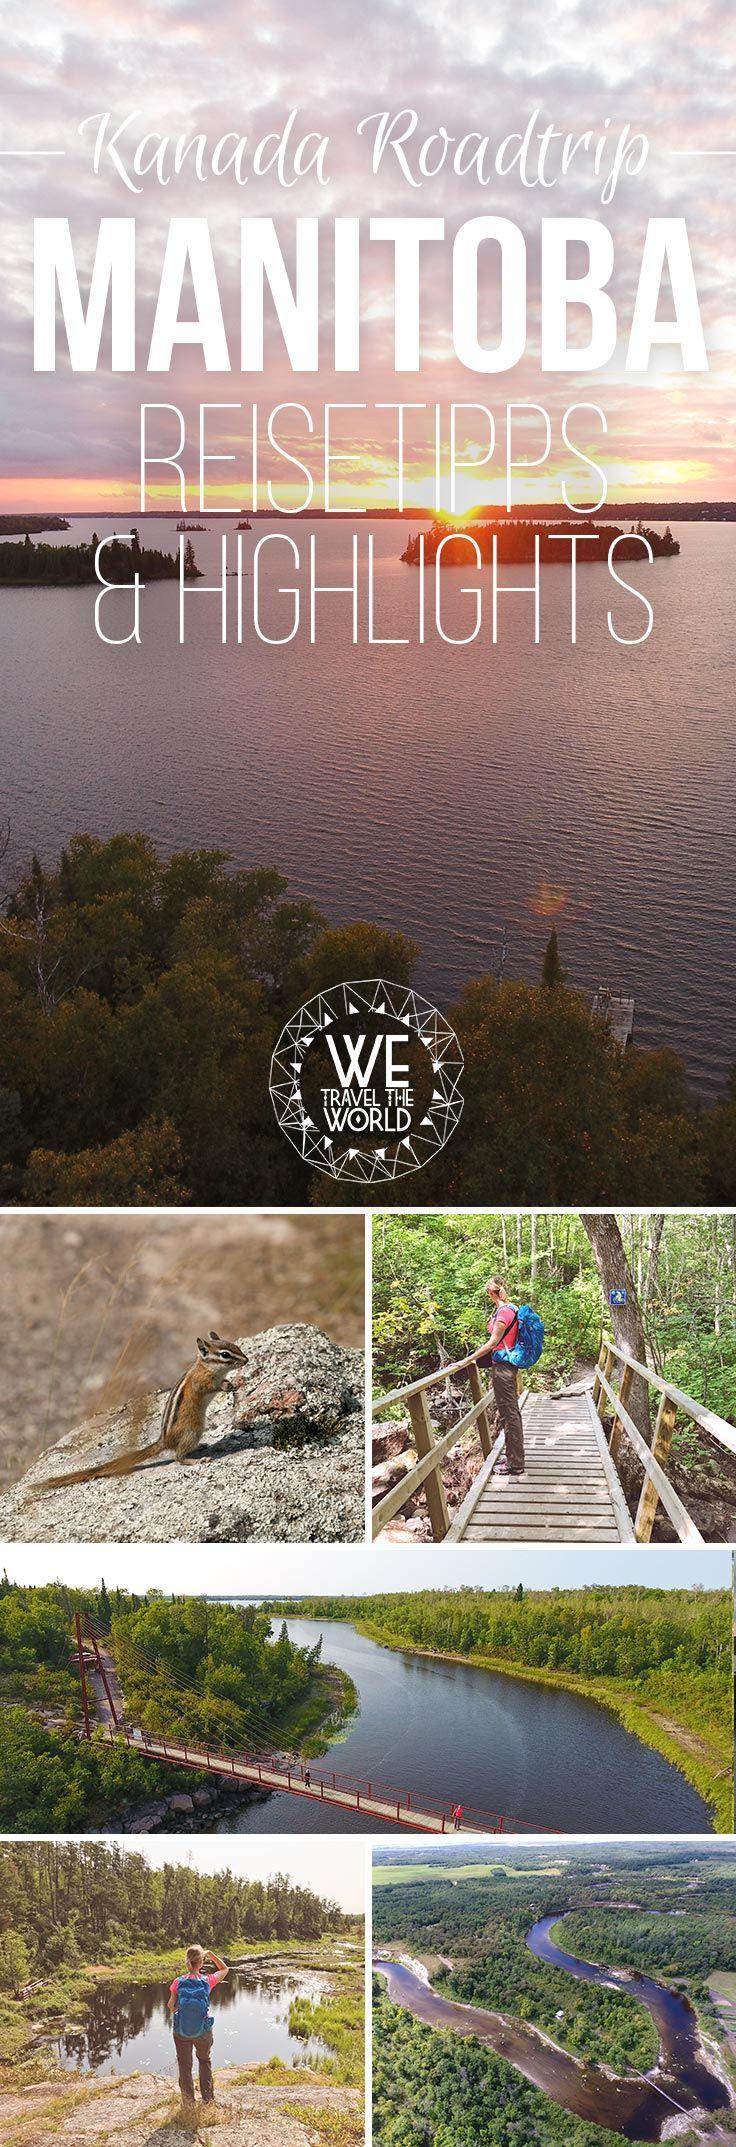 25+ schöne Kanada Ideen auf Pinterest | Emerald lake park, Montana ...